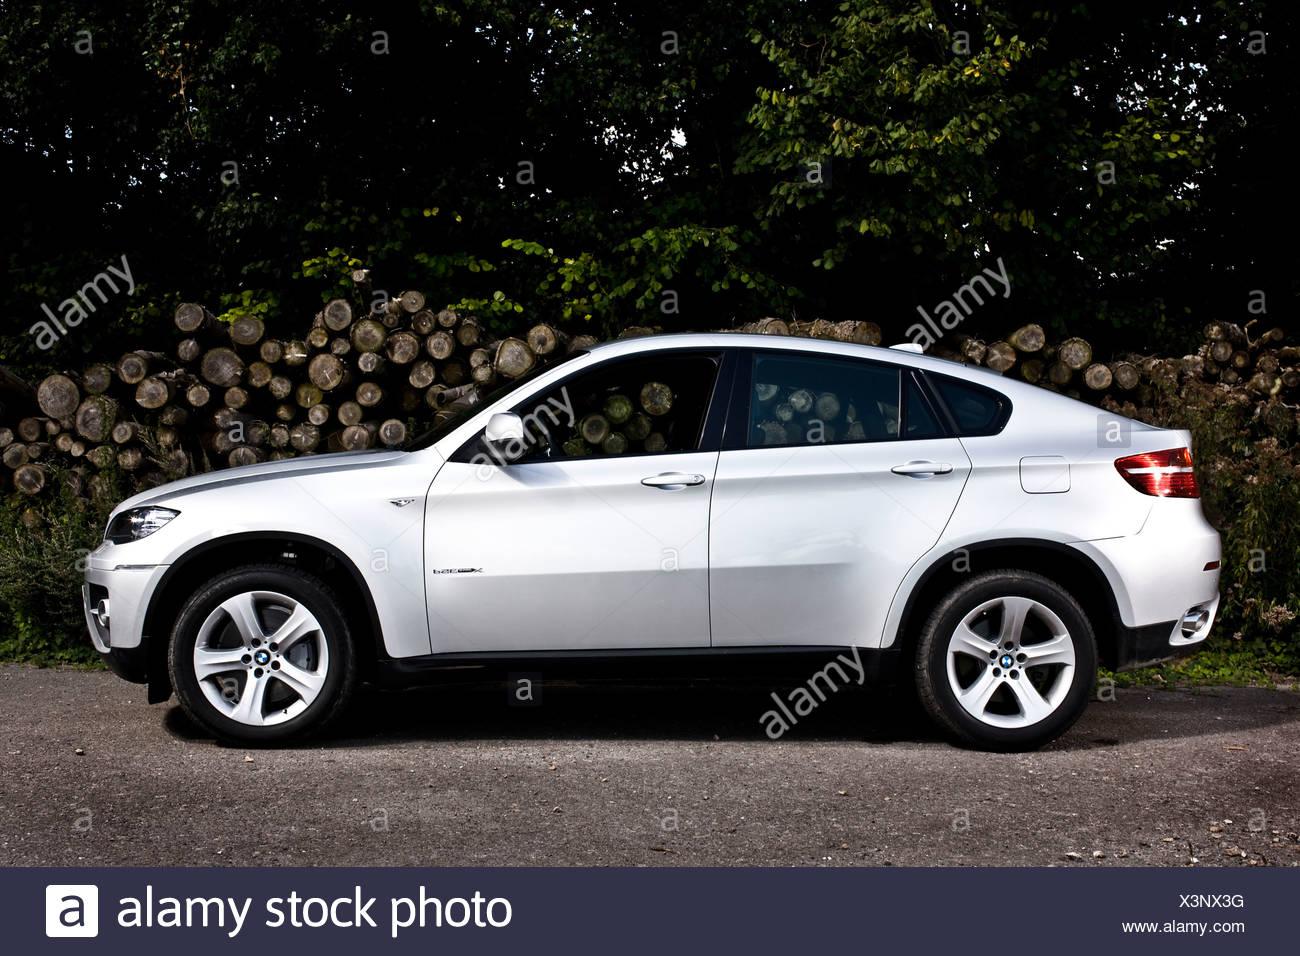 Silver BMW X6 crossover utility liftback - Stock Image